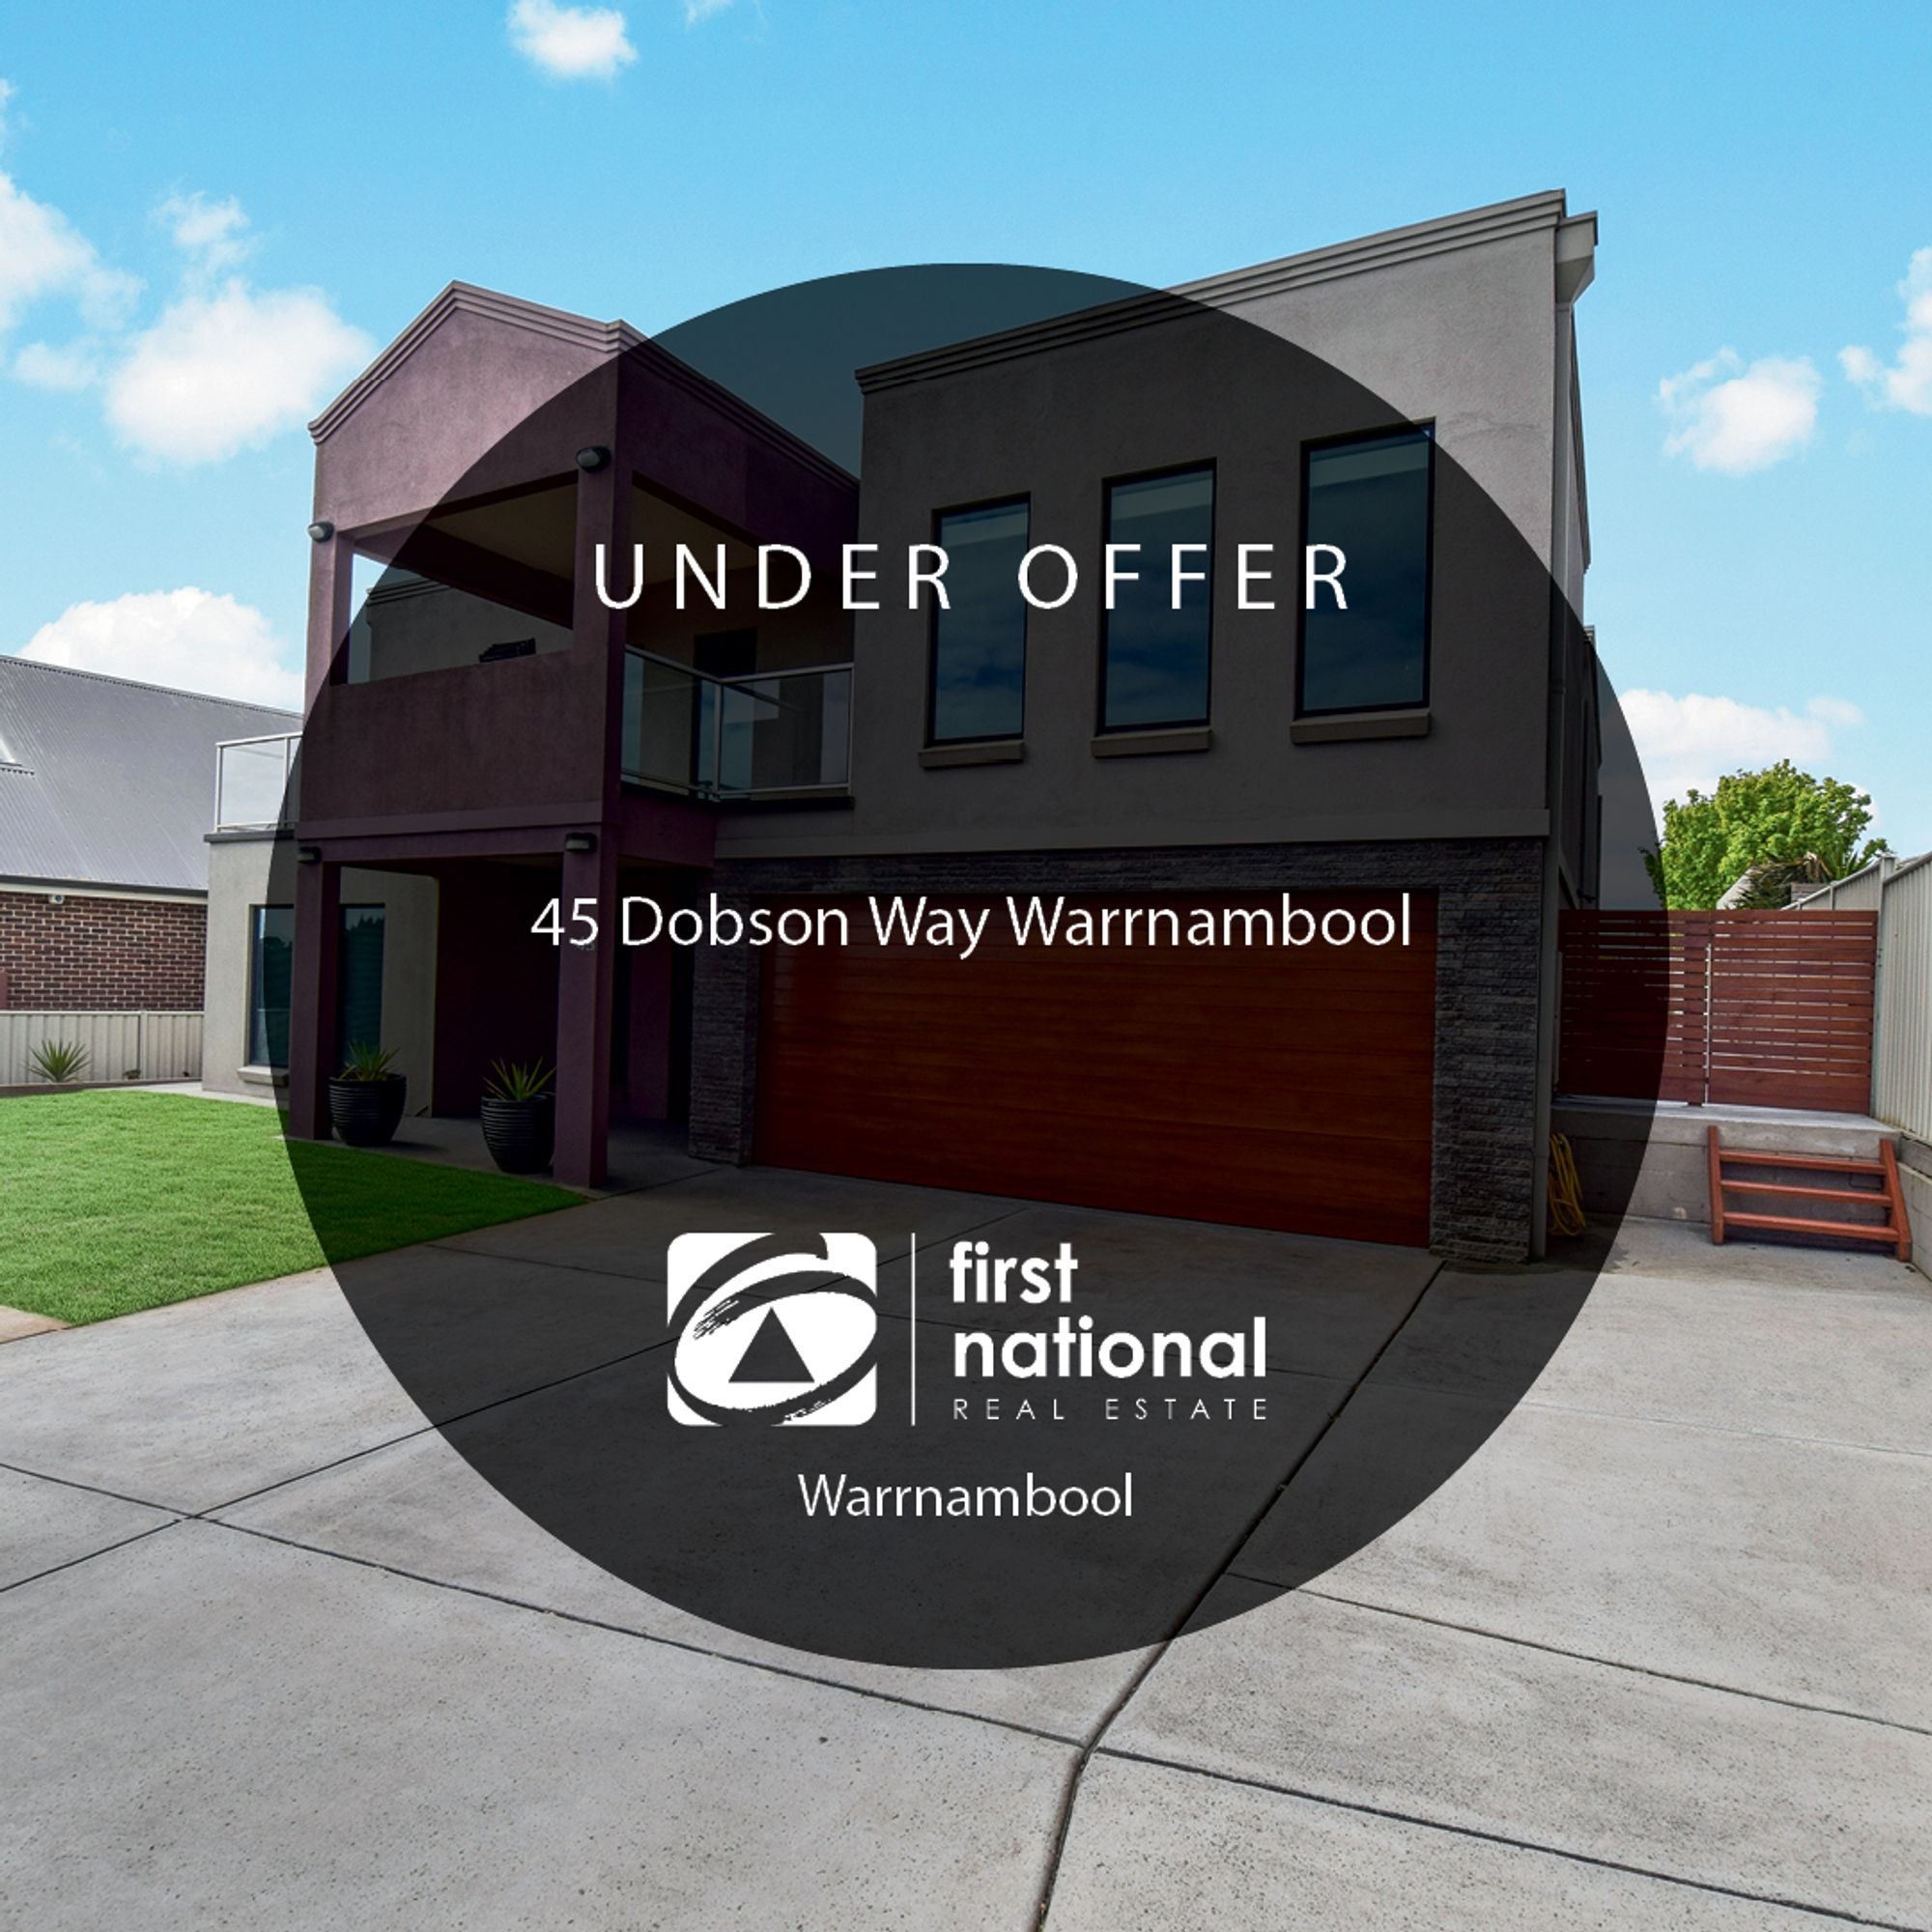 45 Dobson Way, Warrnambool, VIC 3280